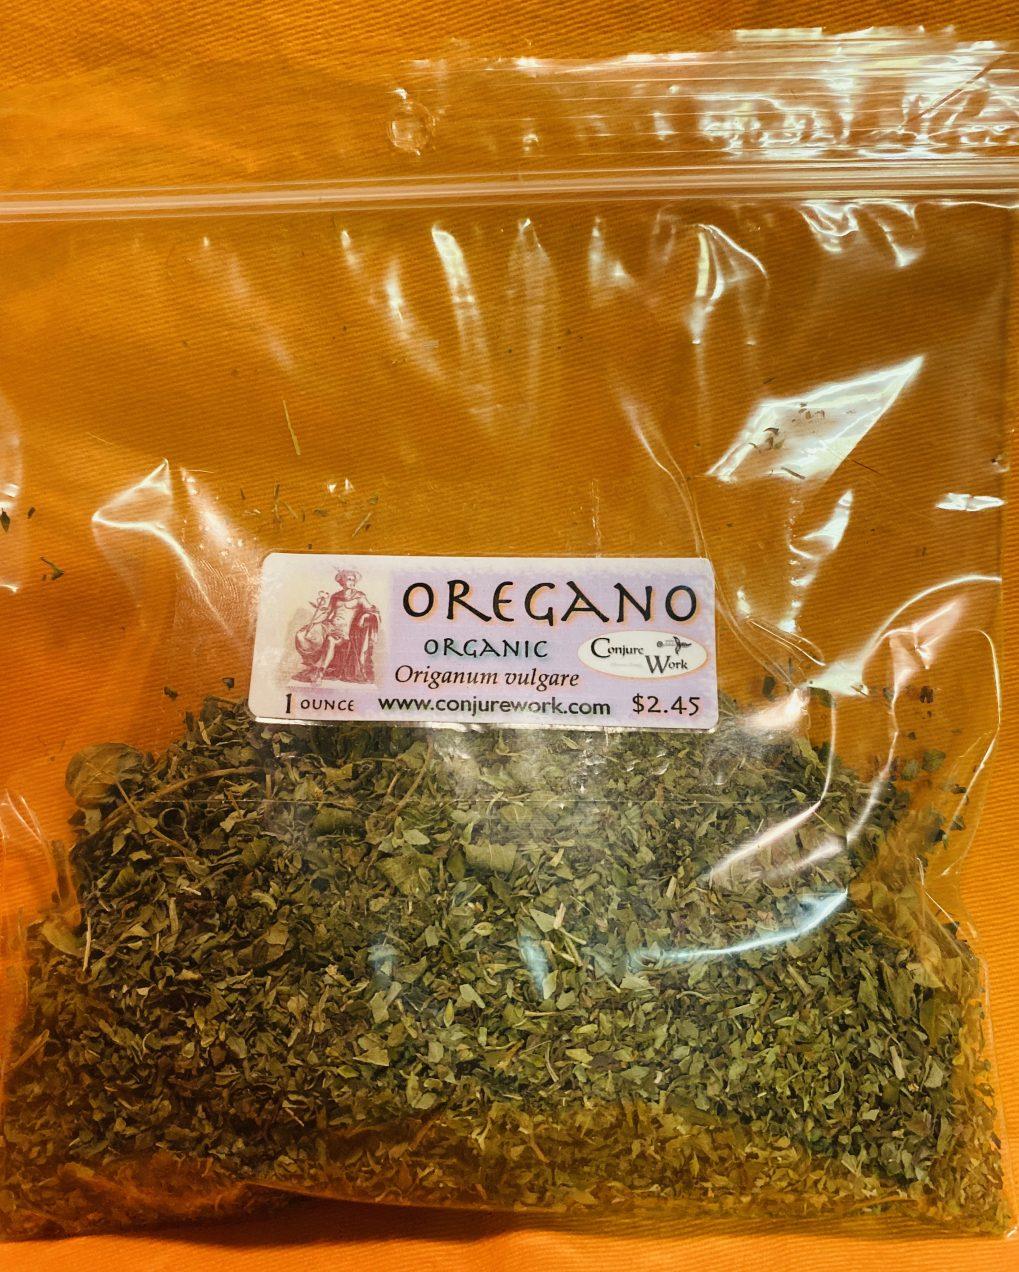 Oregano, Origanum vulgare, herbs for witchcraft, sorcery, Hoodoo spells